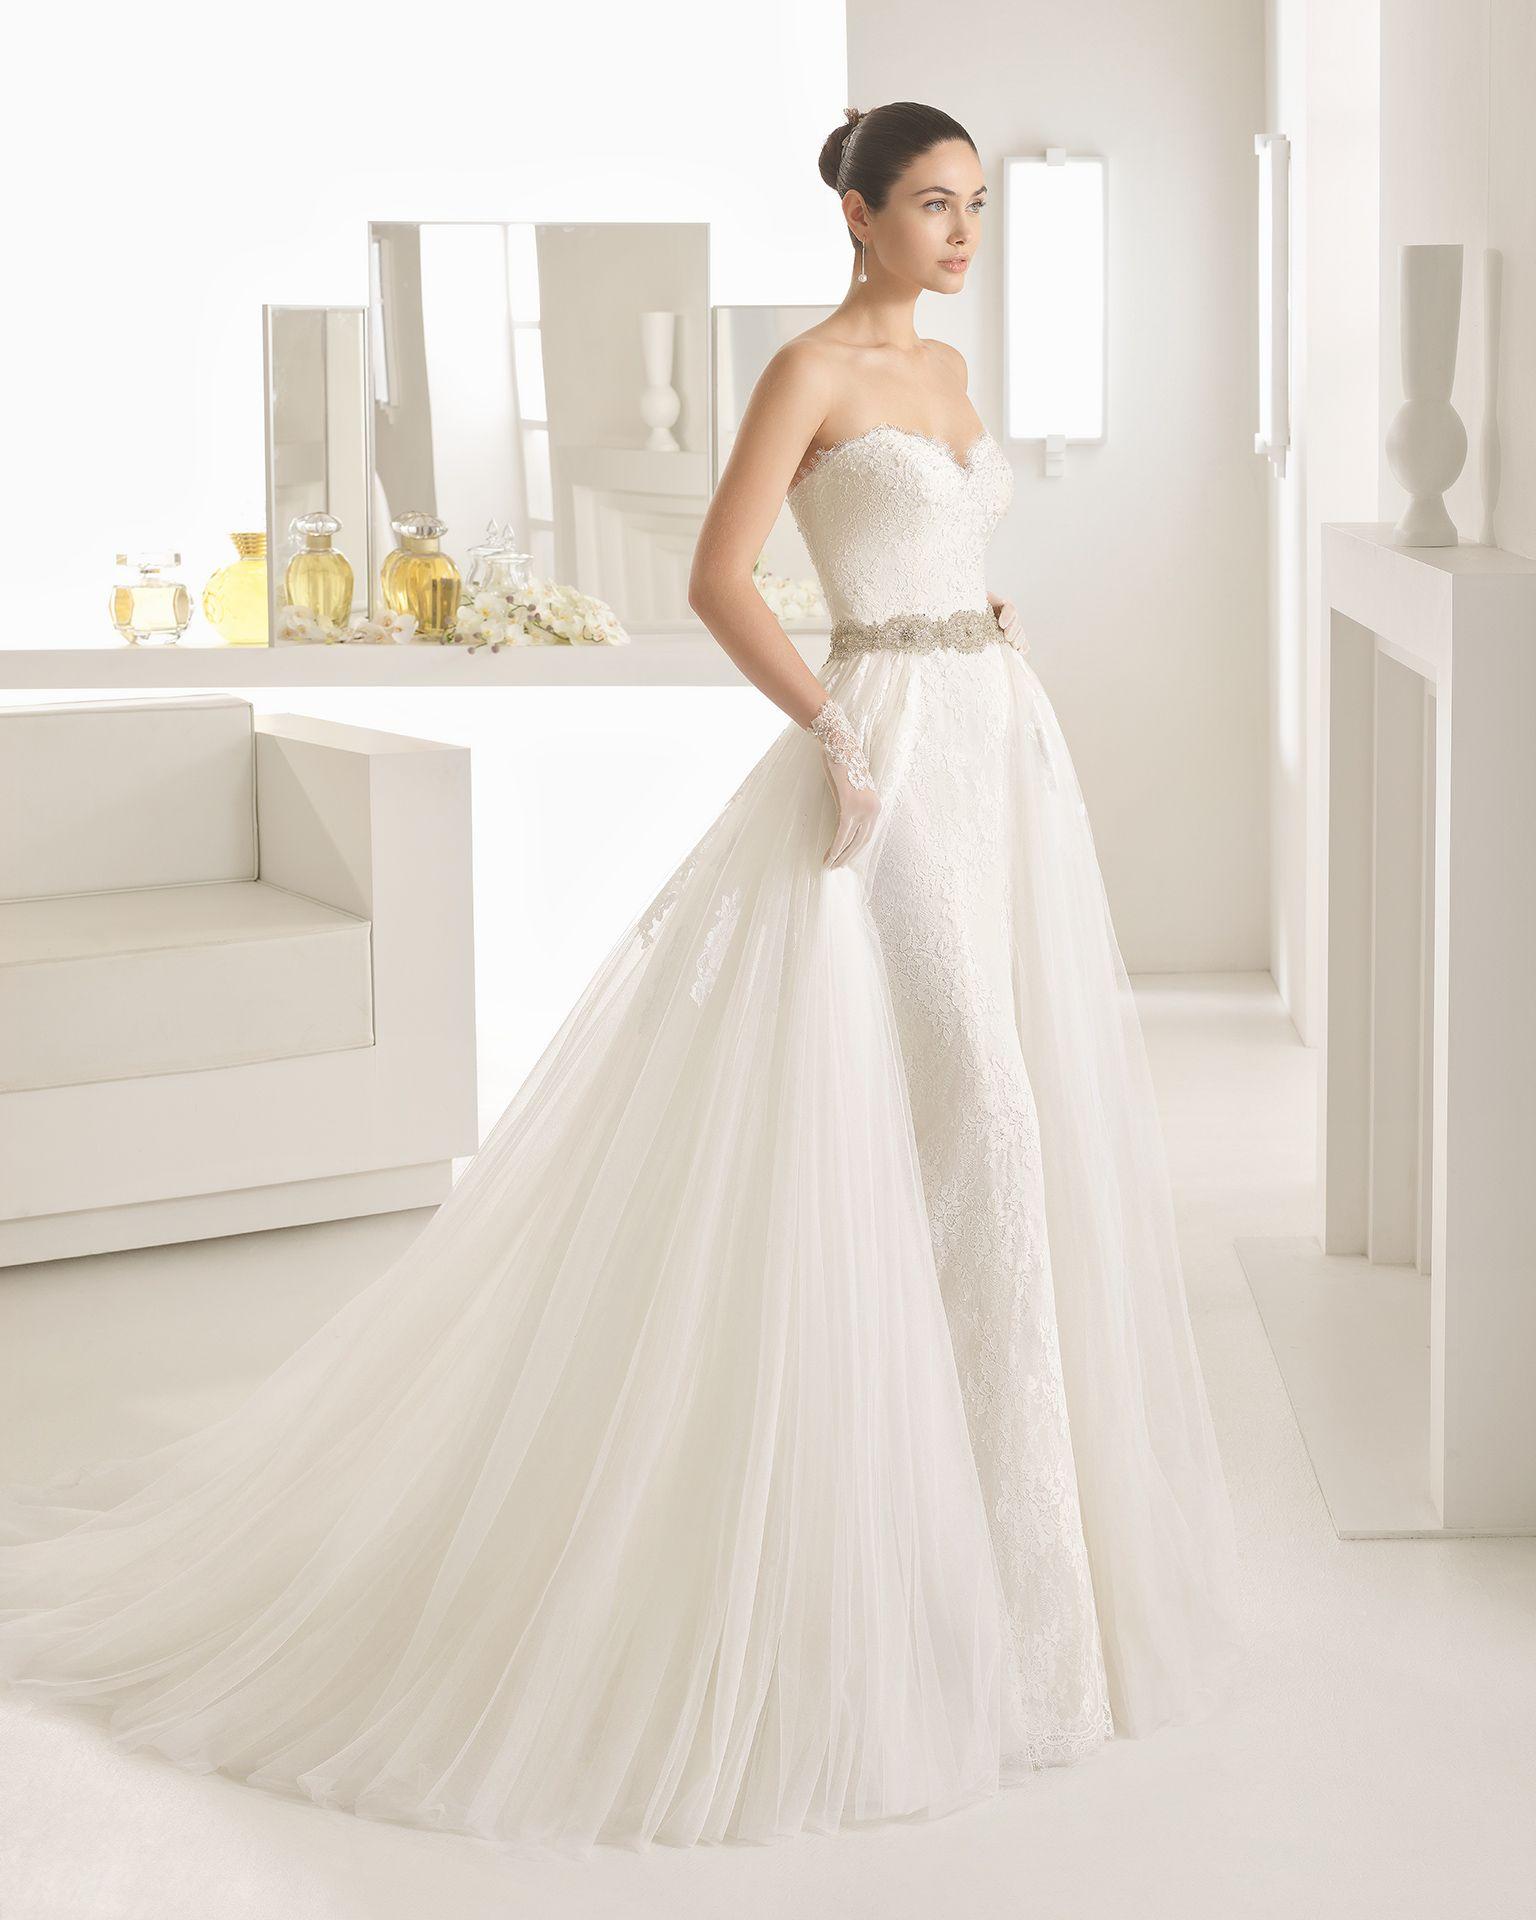 OCCIDENTE - Sposa 2017. Collezione Rosa Clará Two | Wedding dress ...